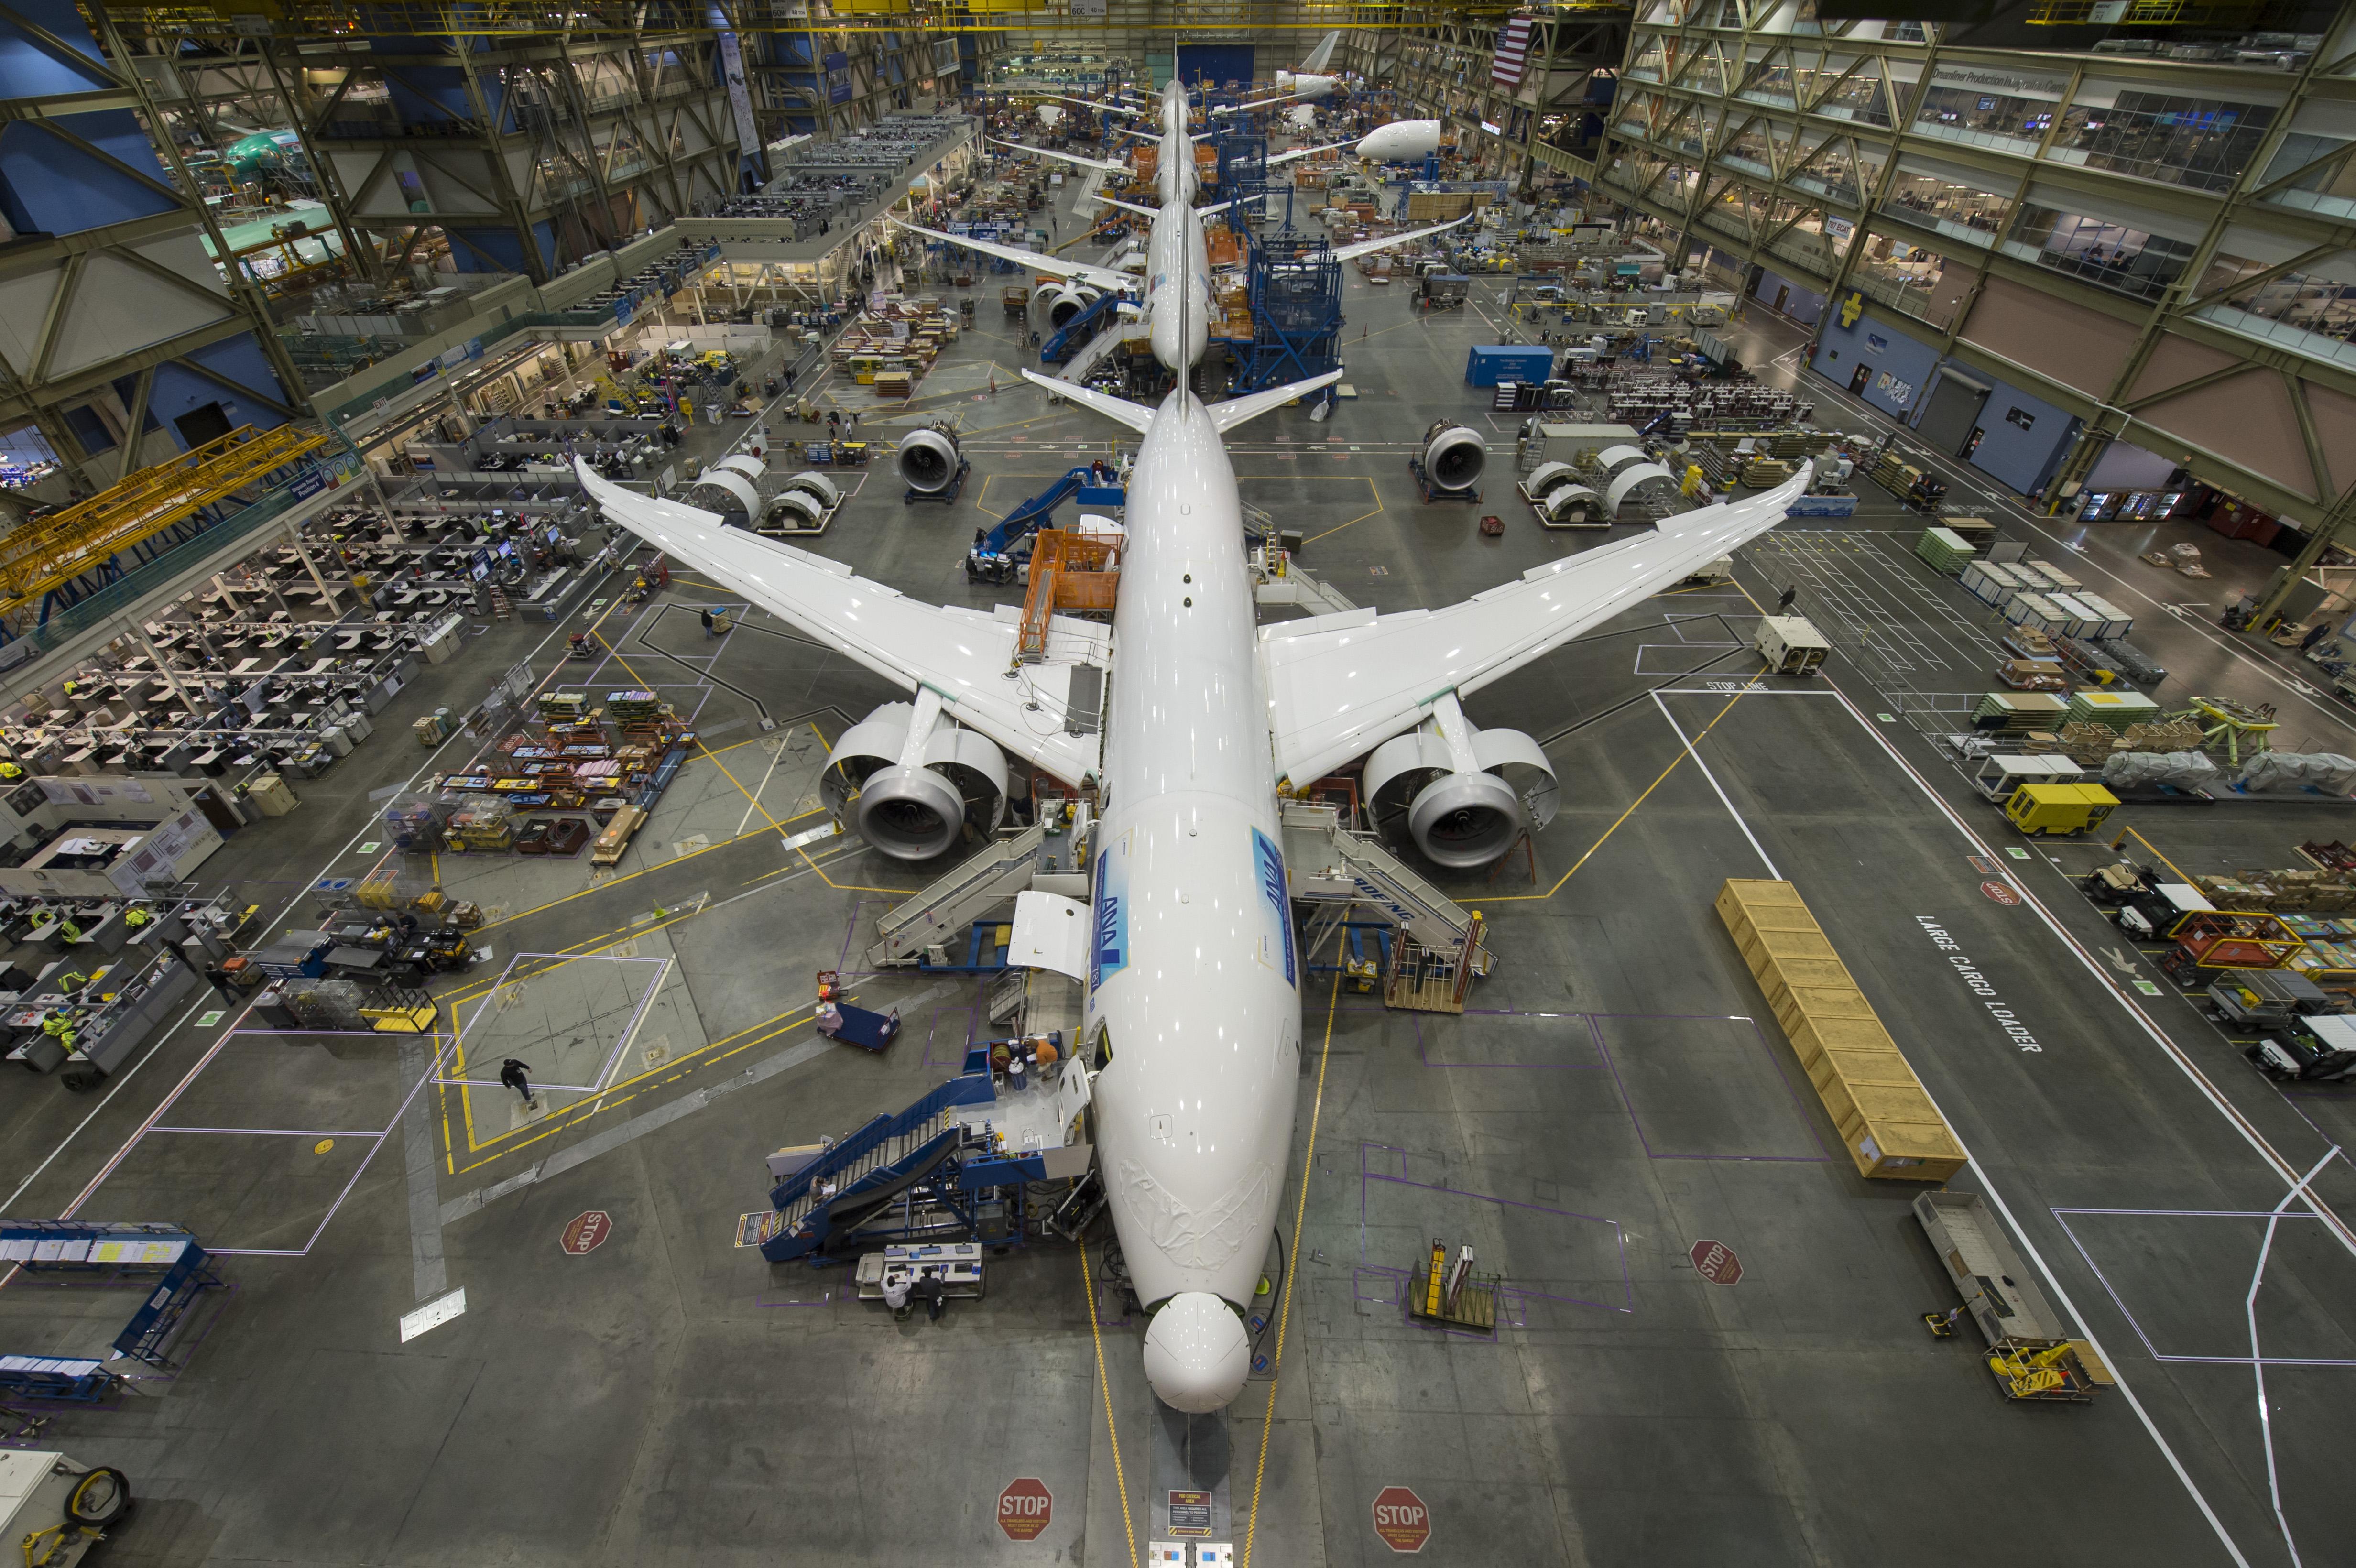 Boeing plant